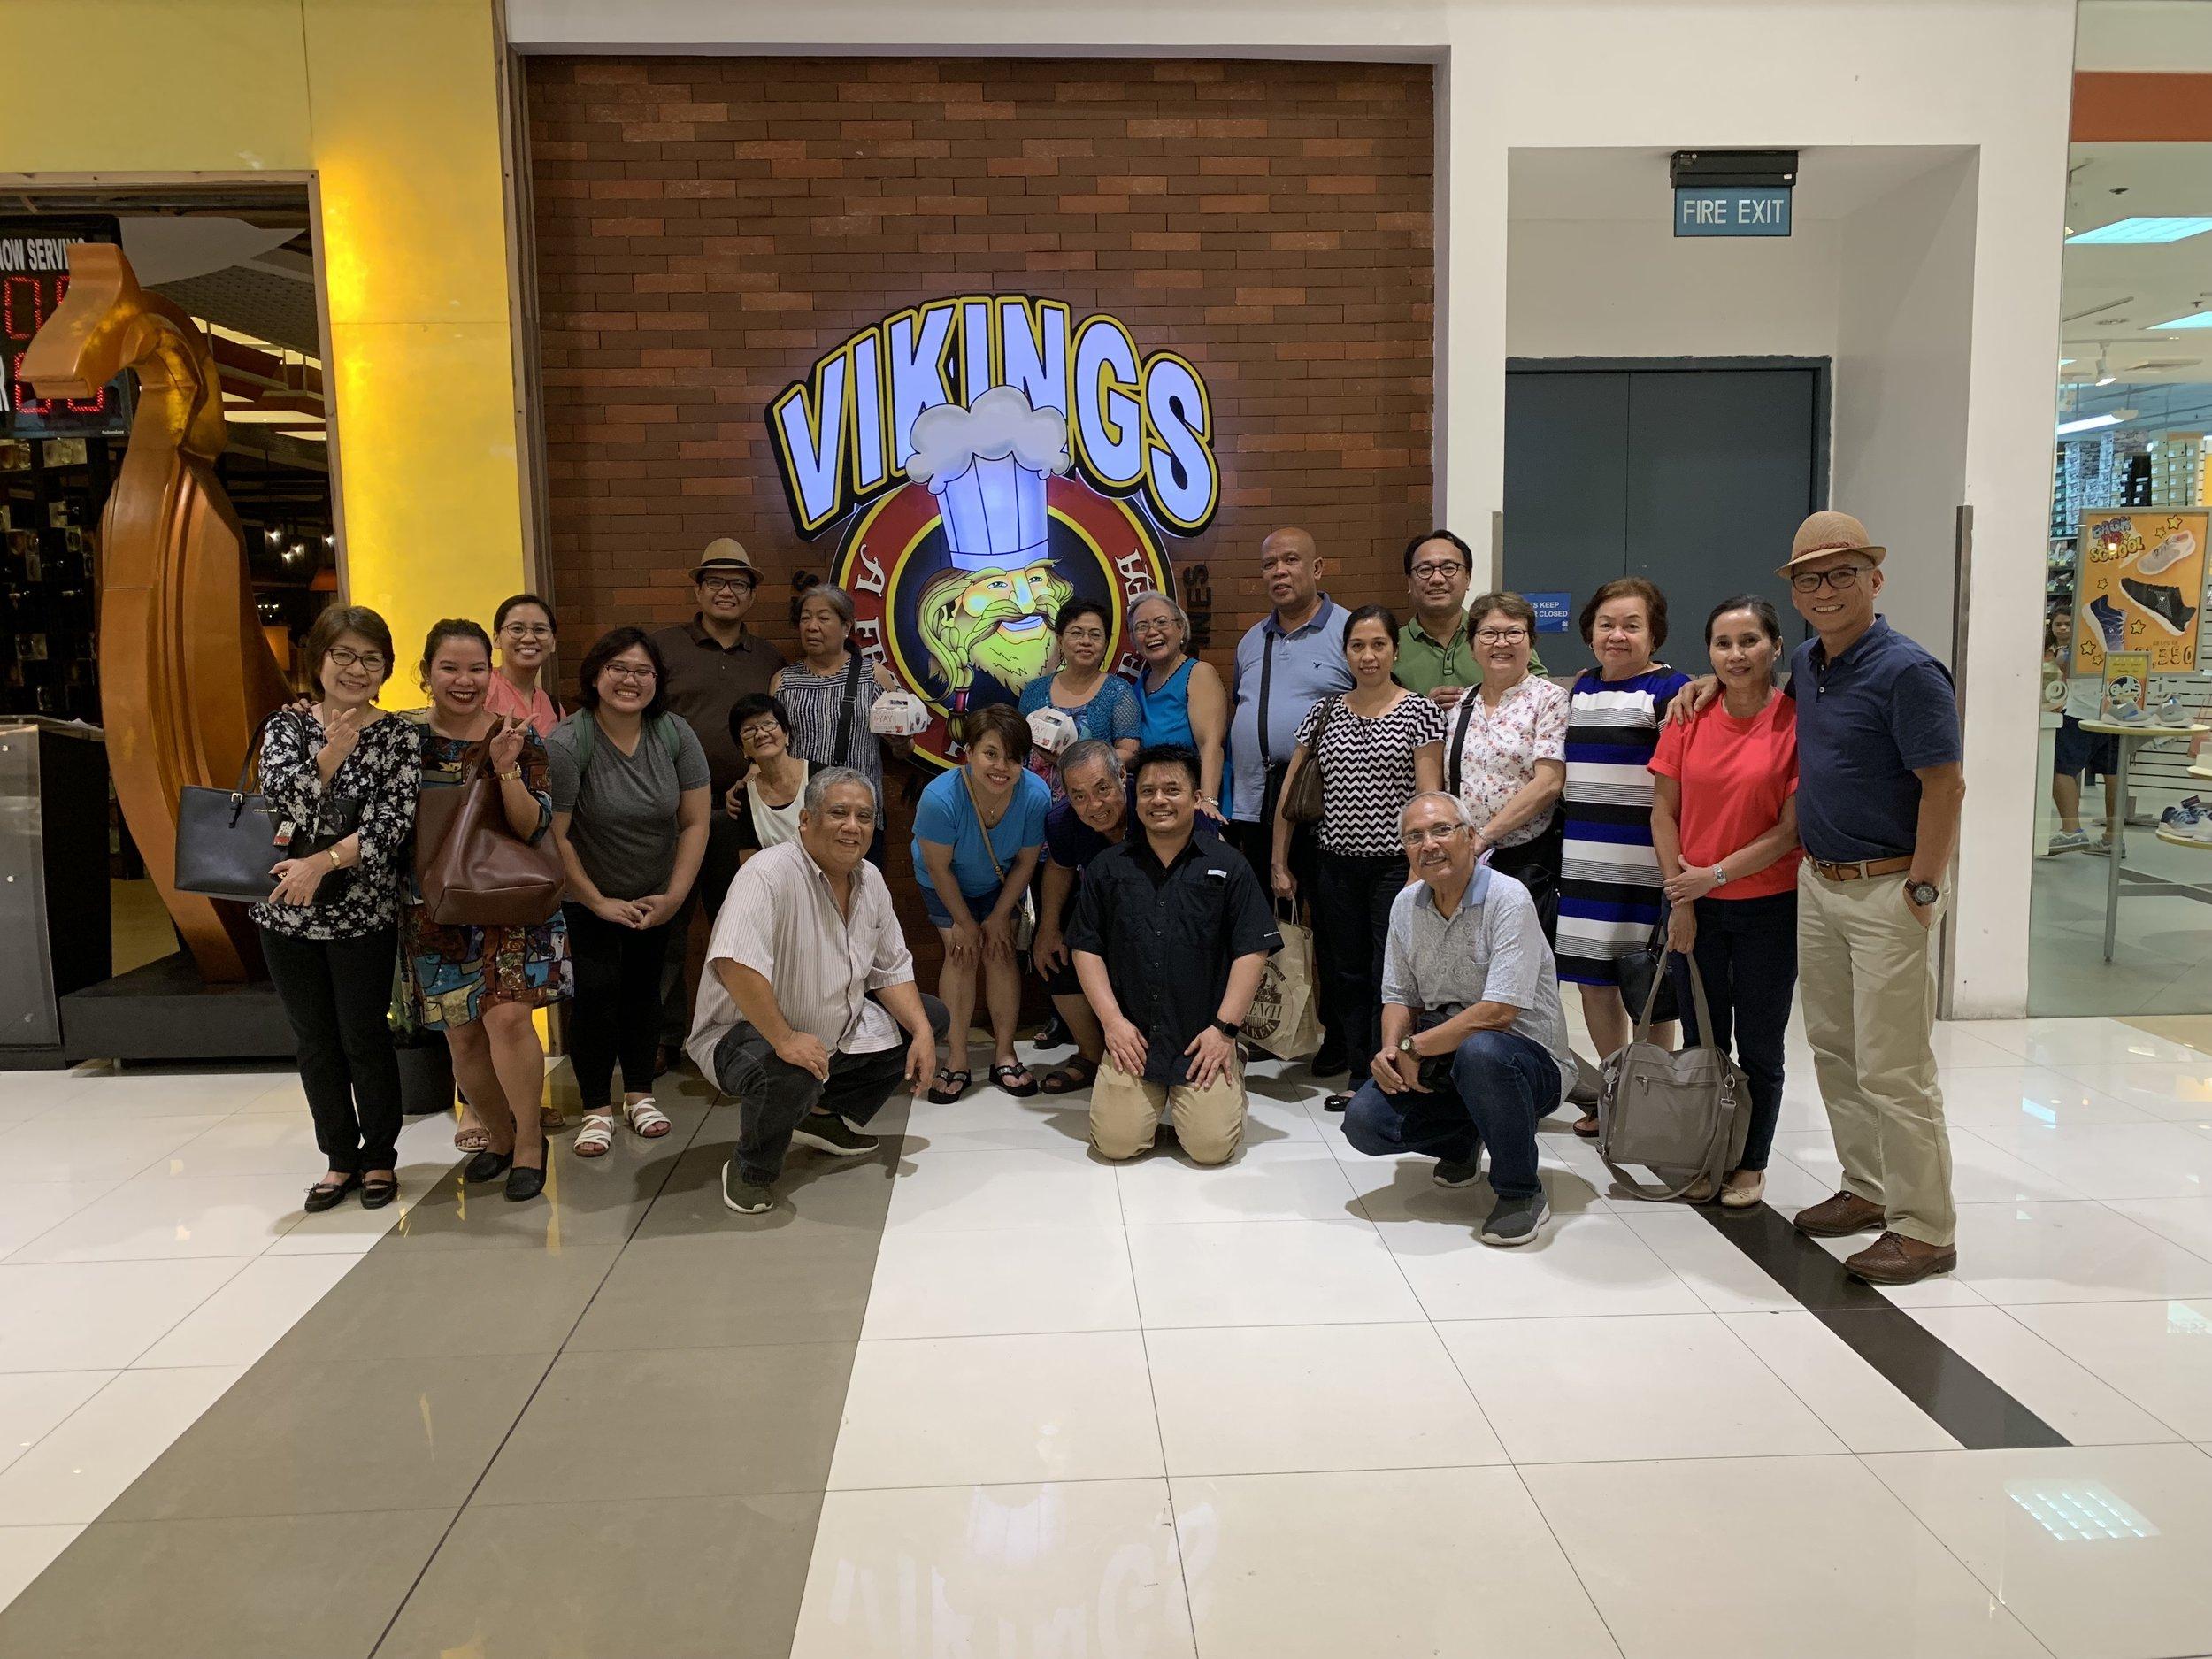 Mom's Birthday bash at Vikings, SM Mall - Marikina.